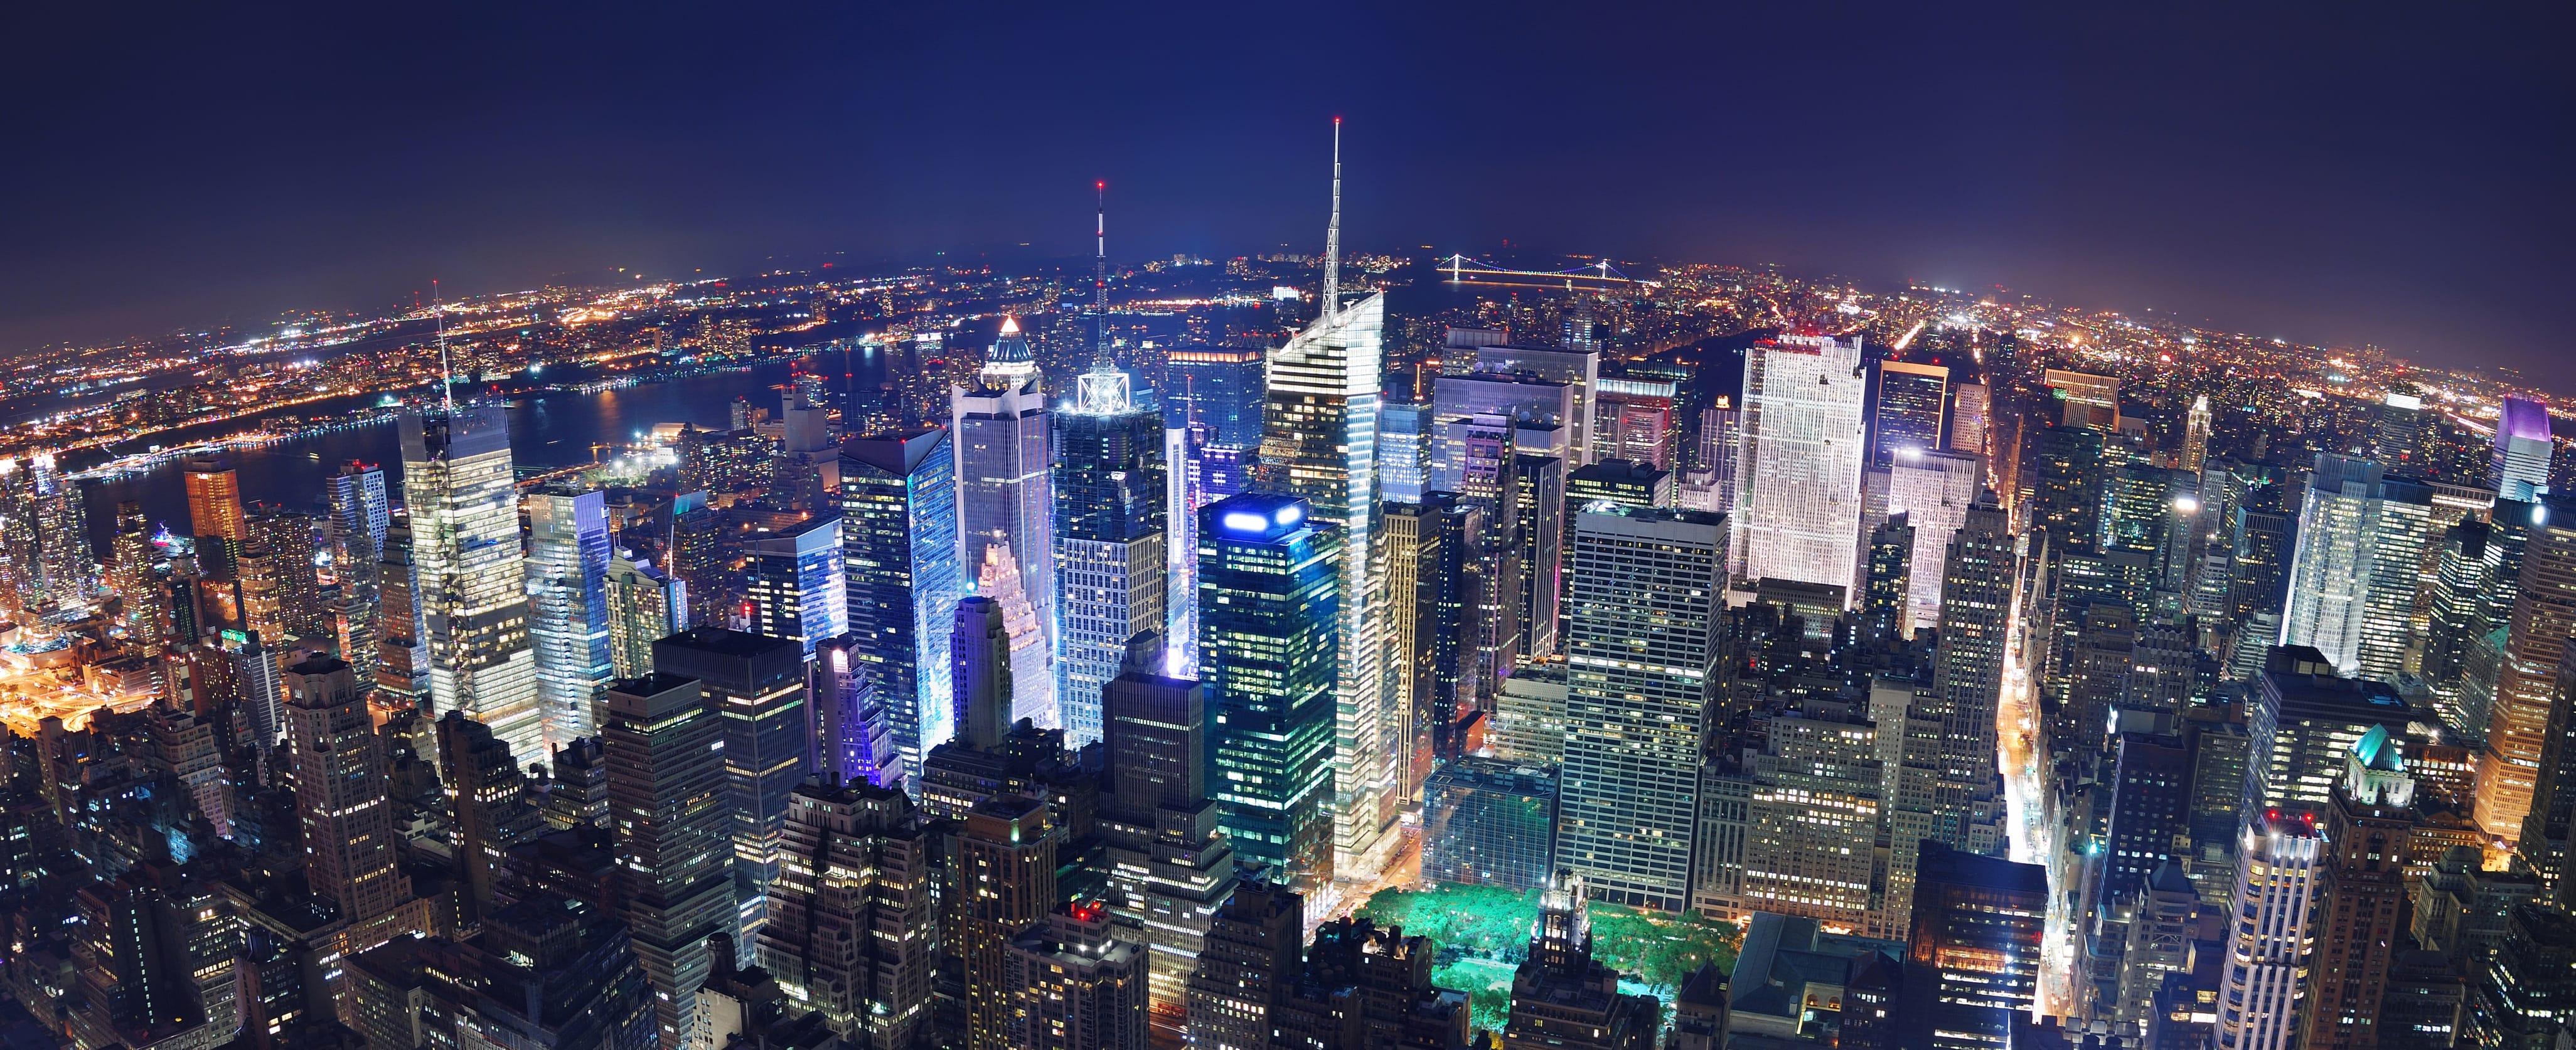 New york sar alimentata solo da energie rinnovabili for Immagini desktop new york